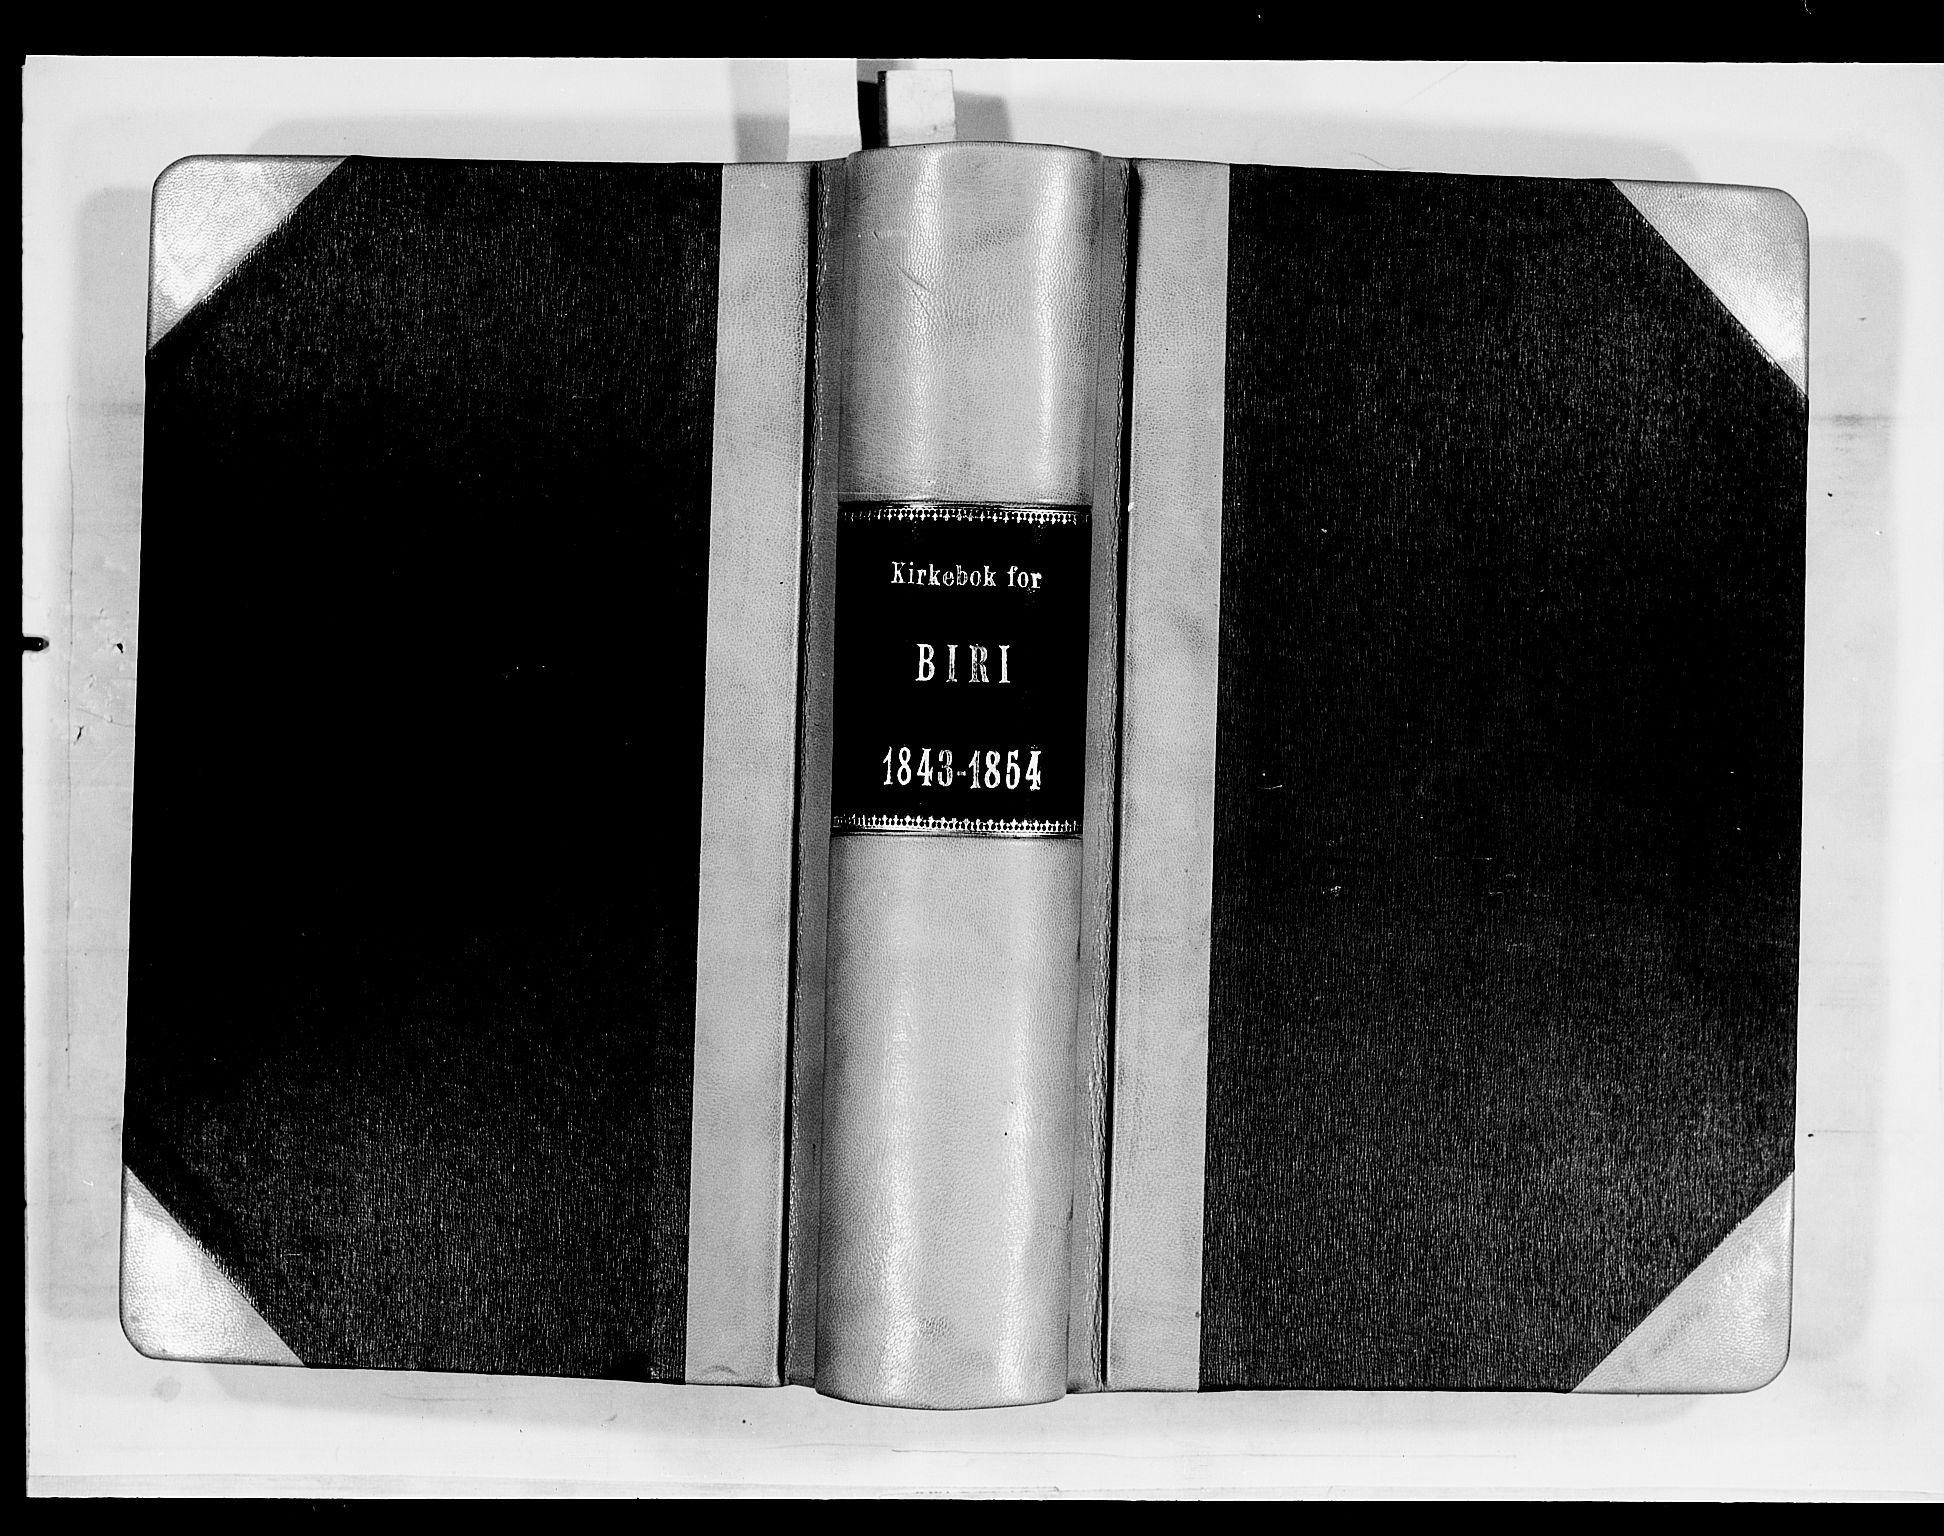 SAH, Biri prestekontor, Ministerialbok nr. 5, 1843-1854